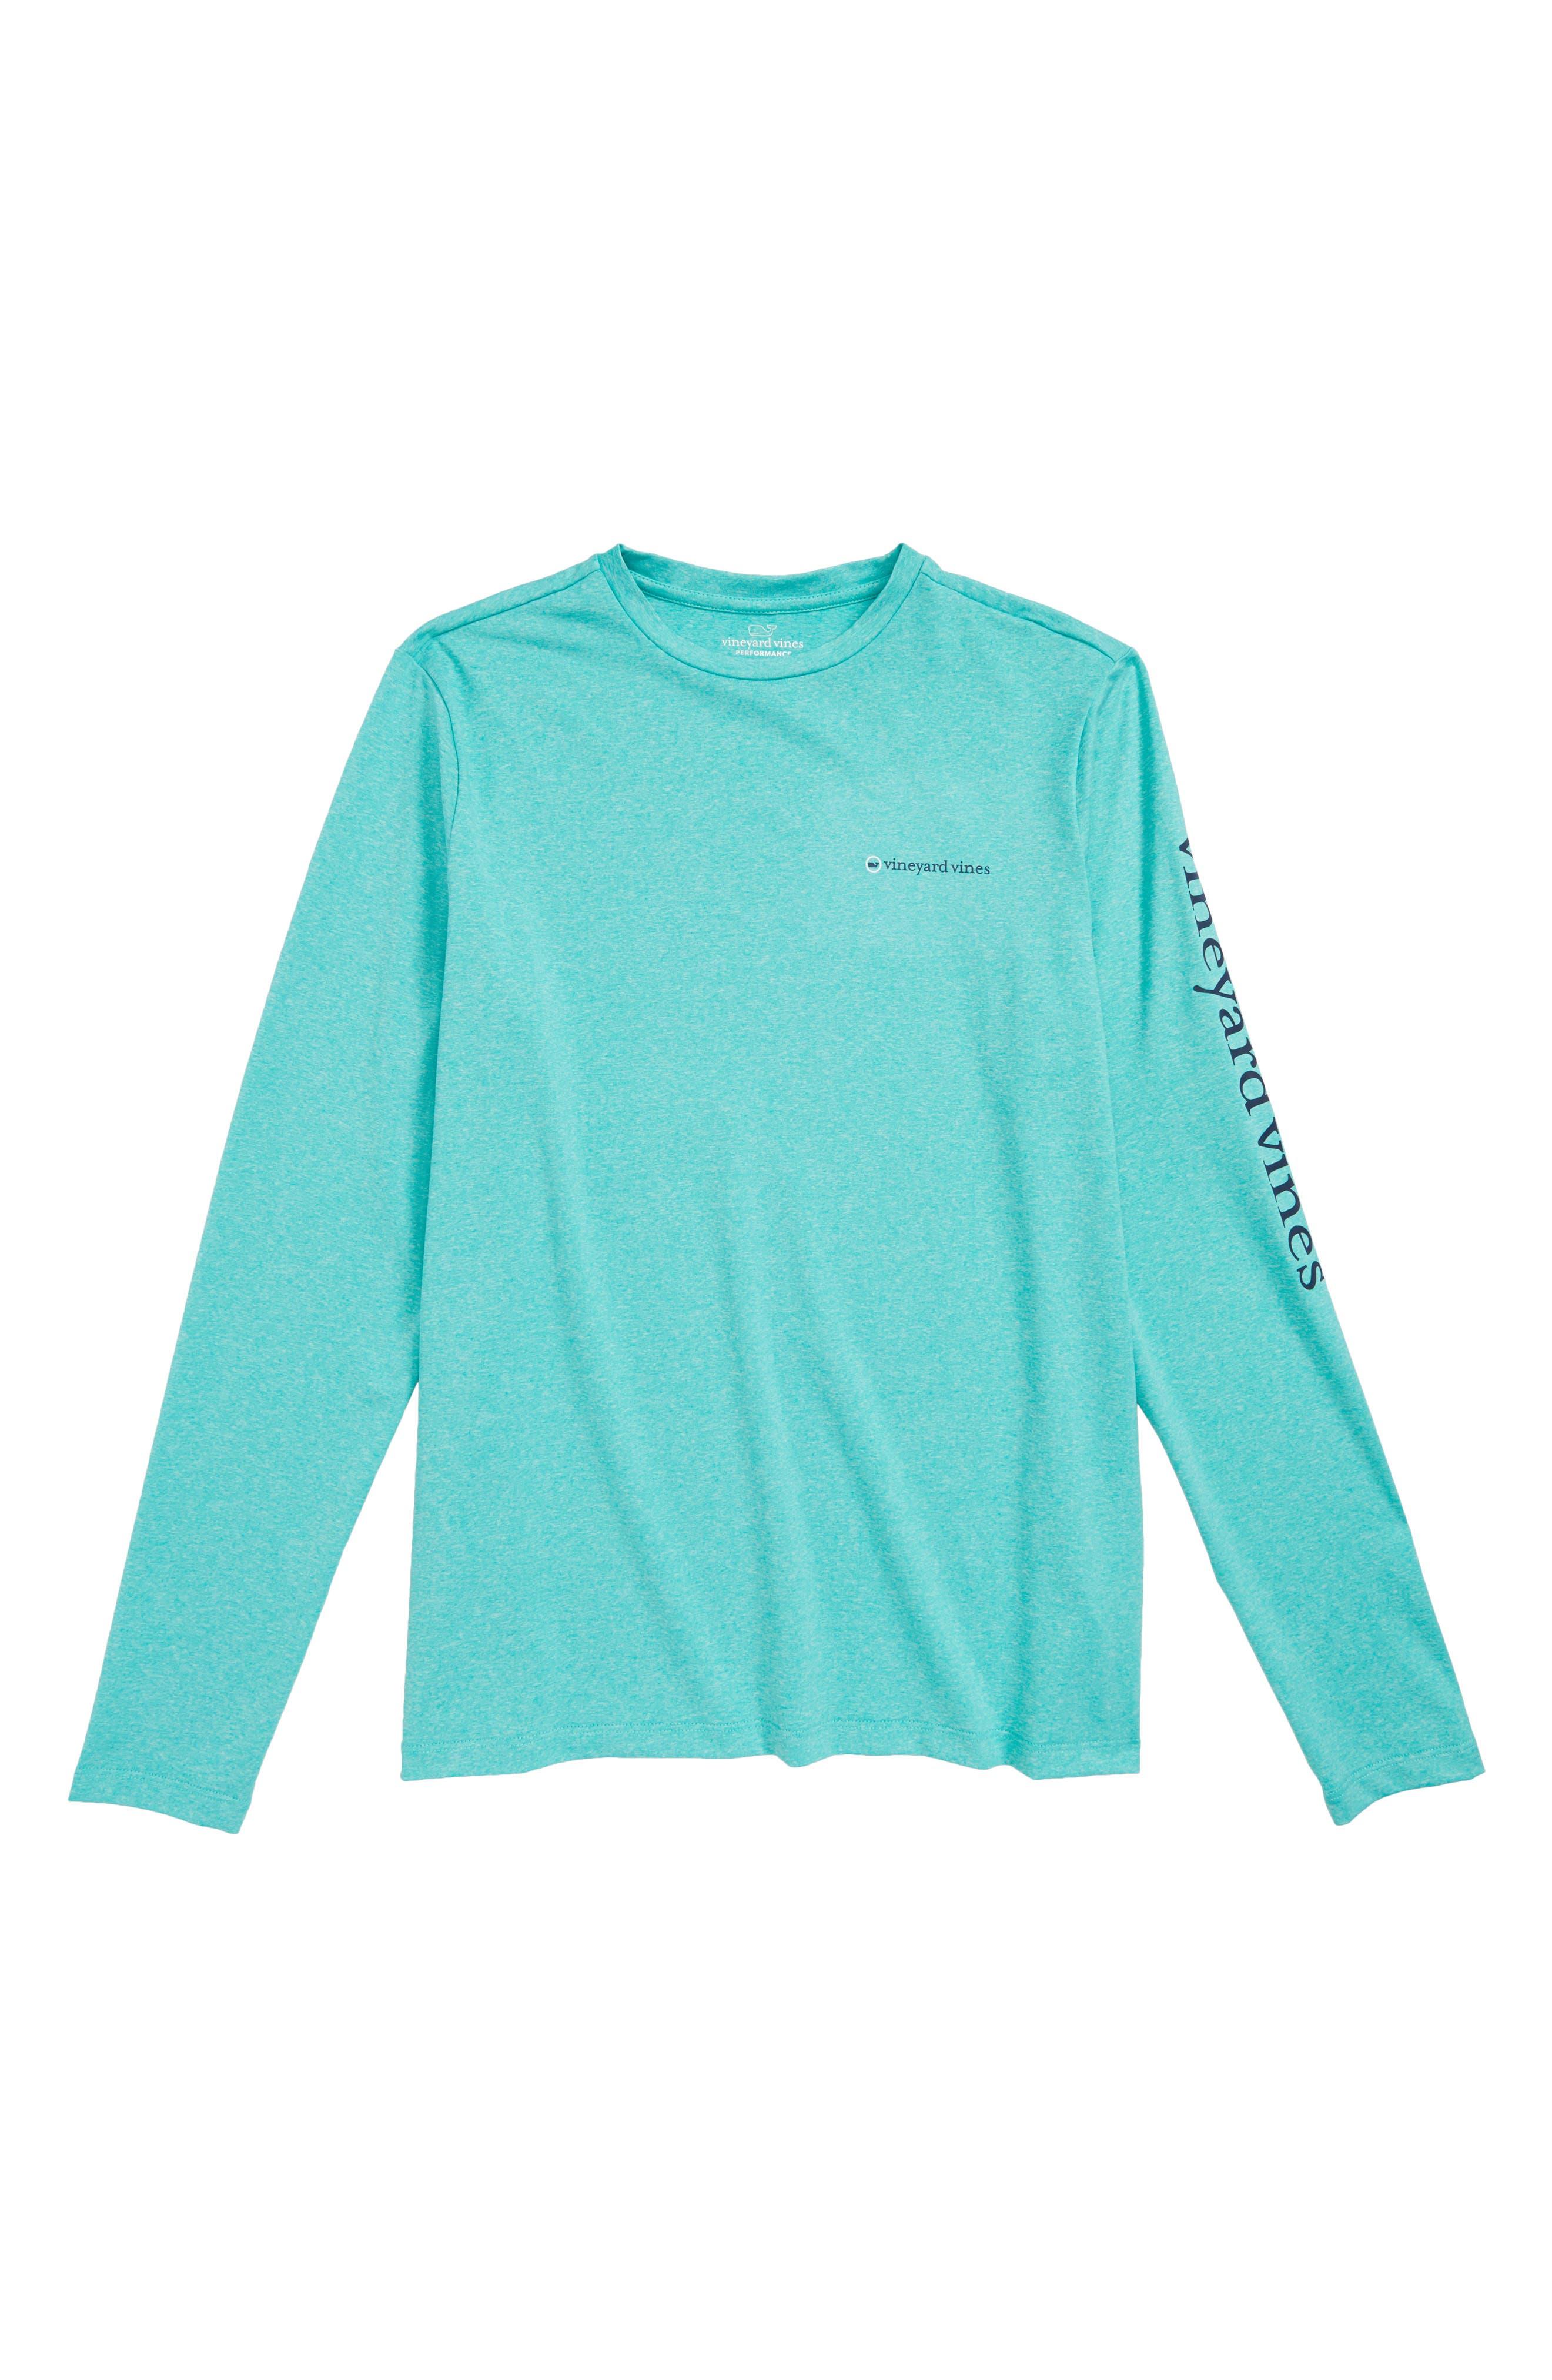 Performance Sport T-Shirt,                             Main thumbnail 1, color,                             440